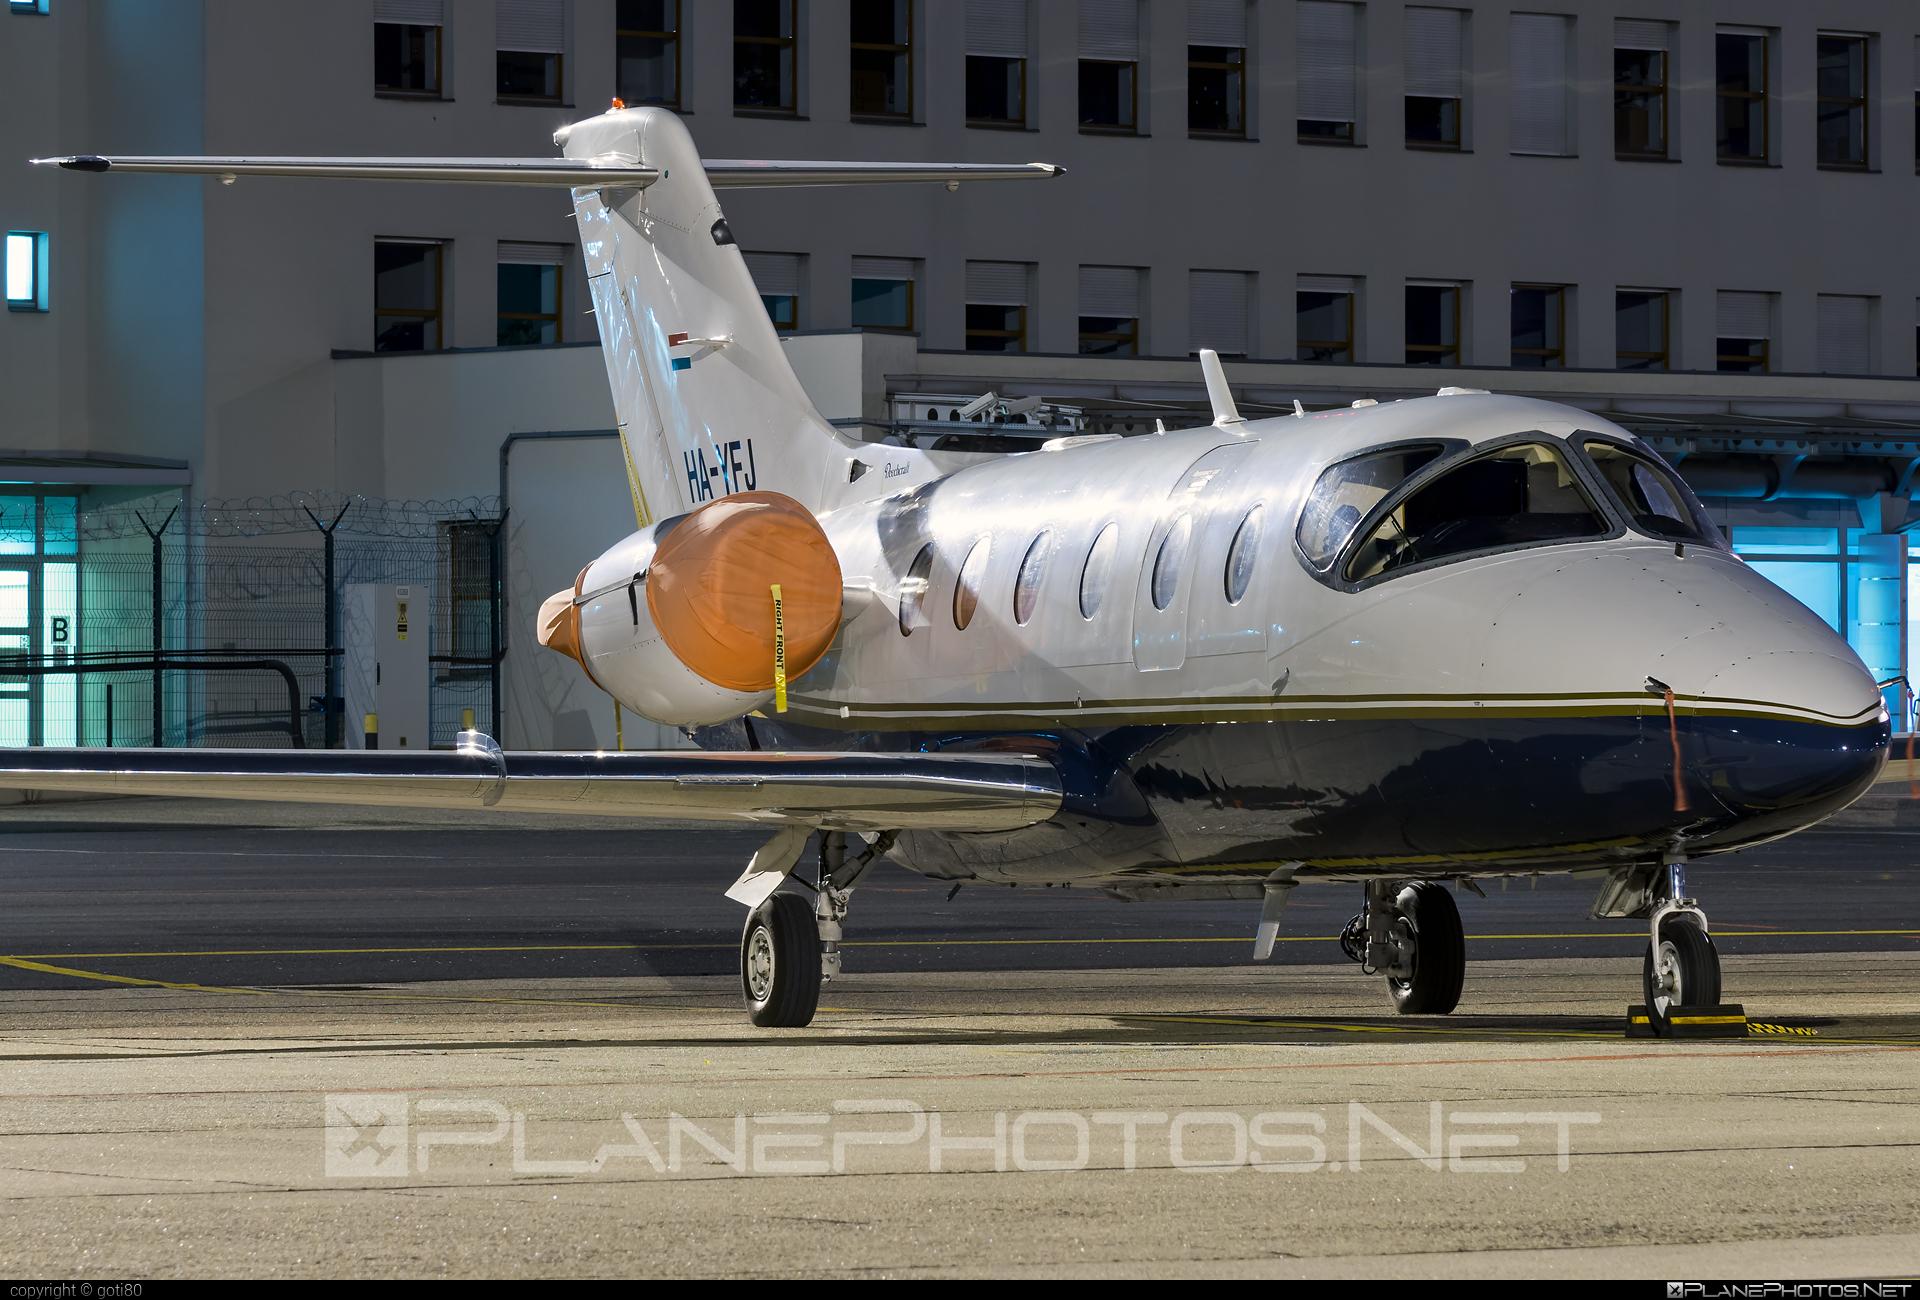 Beechcraft Beechjet 400A - HA-YFJ operated by Pannon Air Service #beech400 #beechcraft #beechcraft400 #beechcraftbeetjet400a #beechjet400 #beetjet400a #pannonairservice